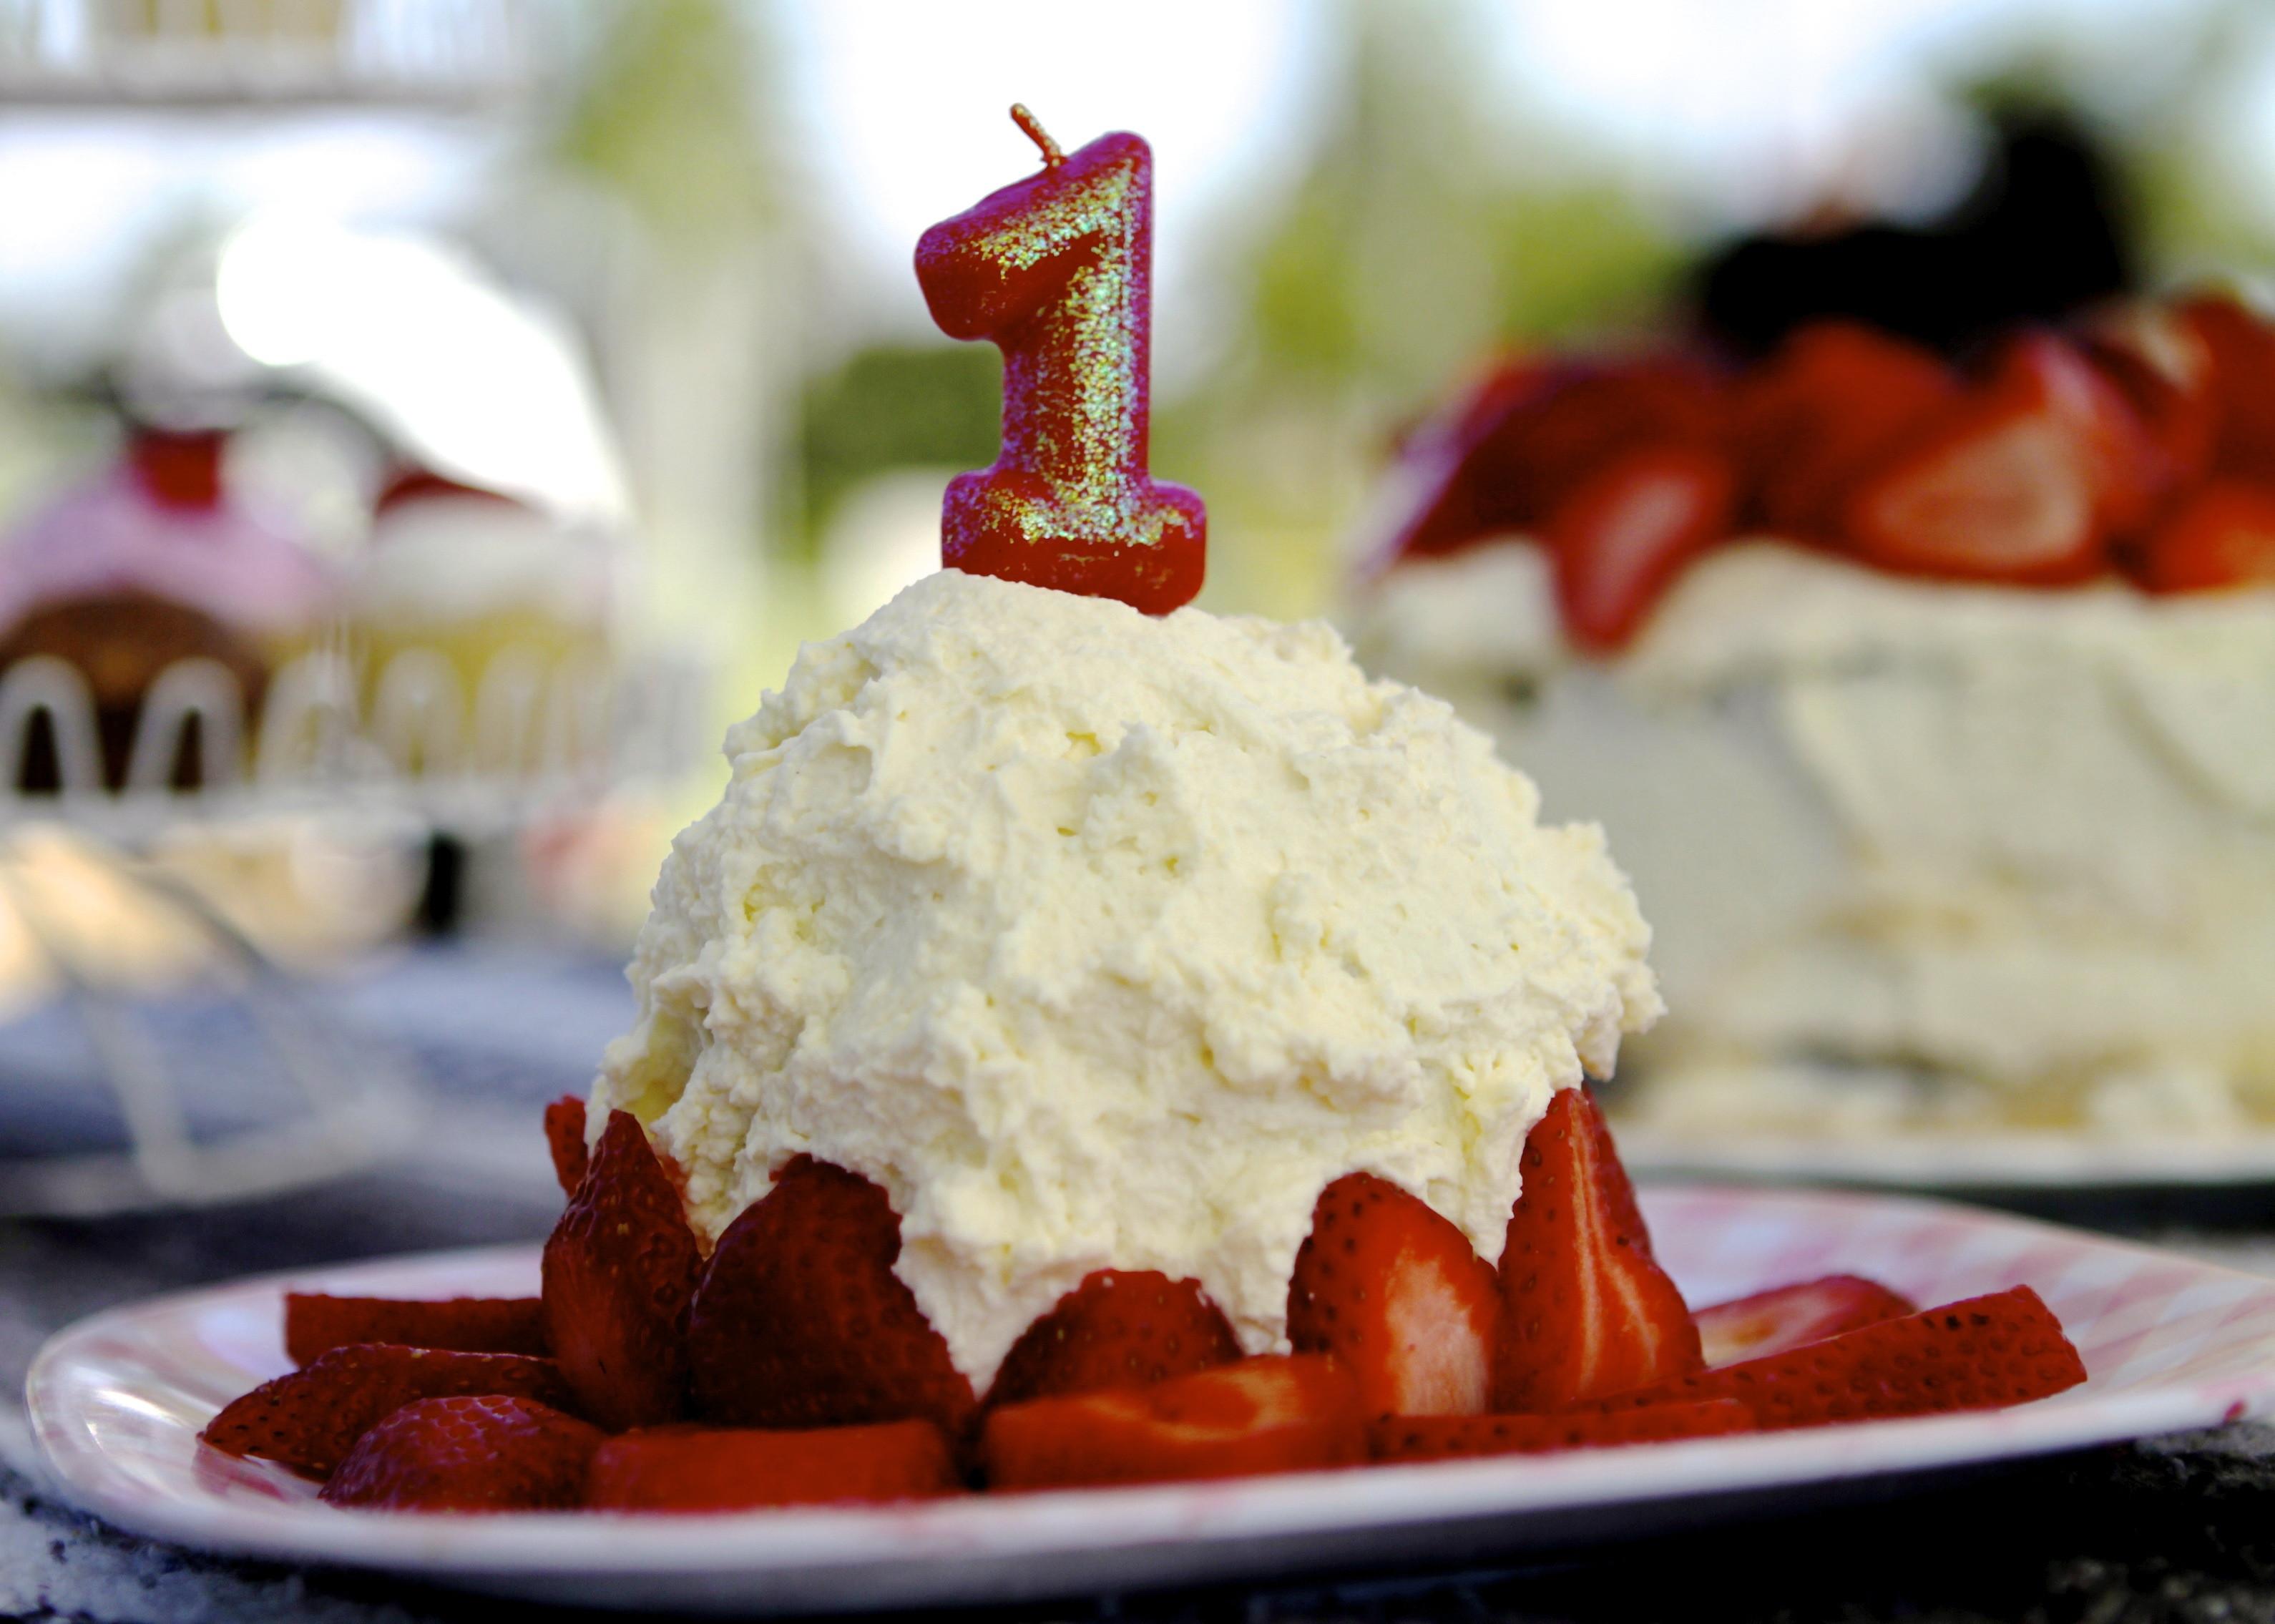 Healthy Smash Cake Recipes  Baby Bird s Banana Smash Cake A Healthier Option for a